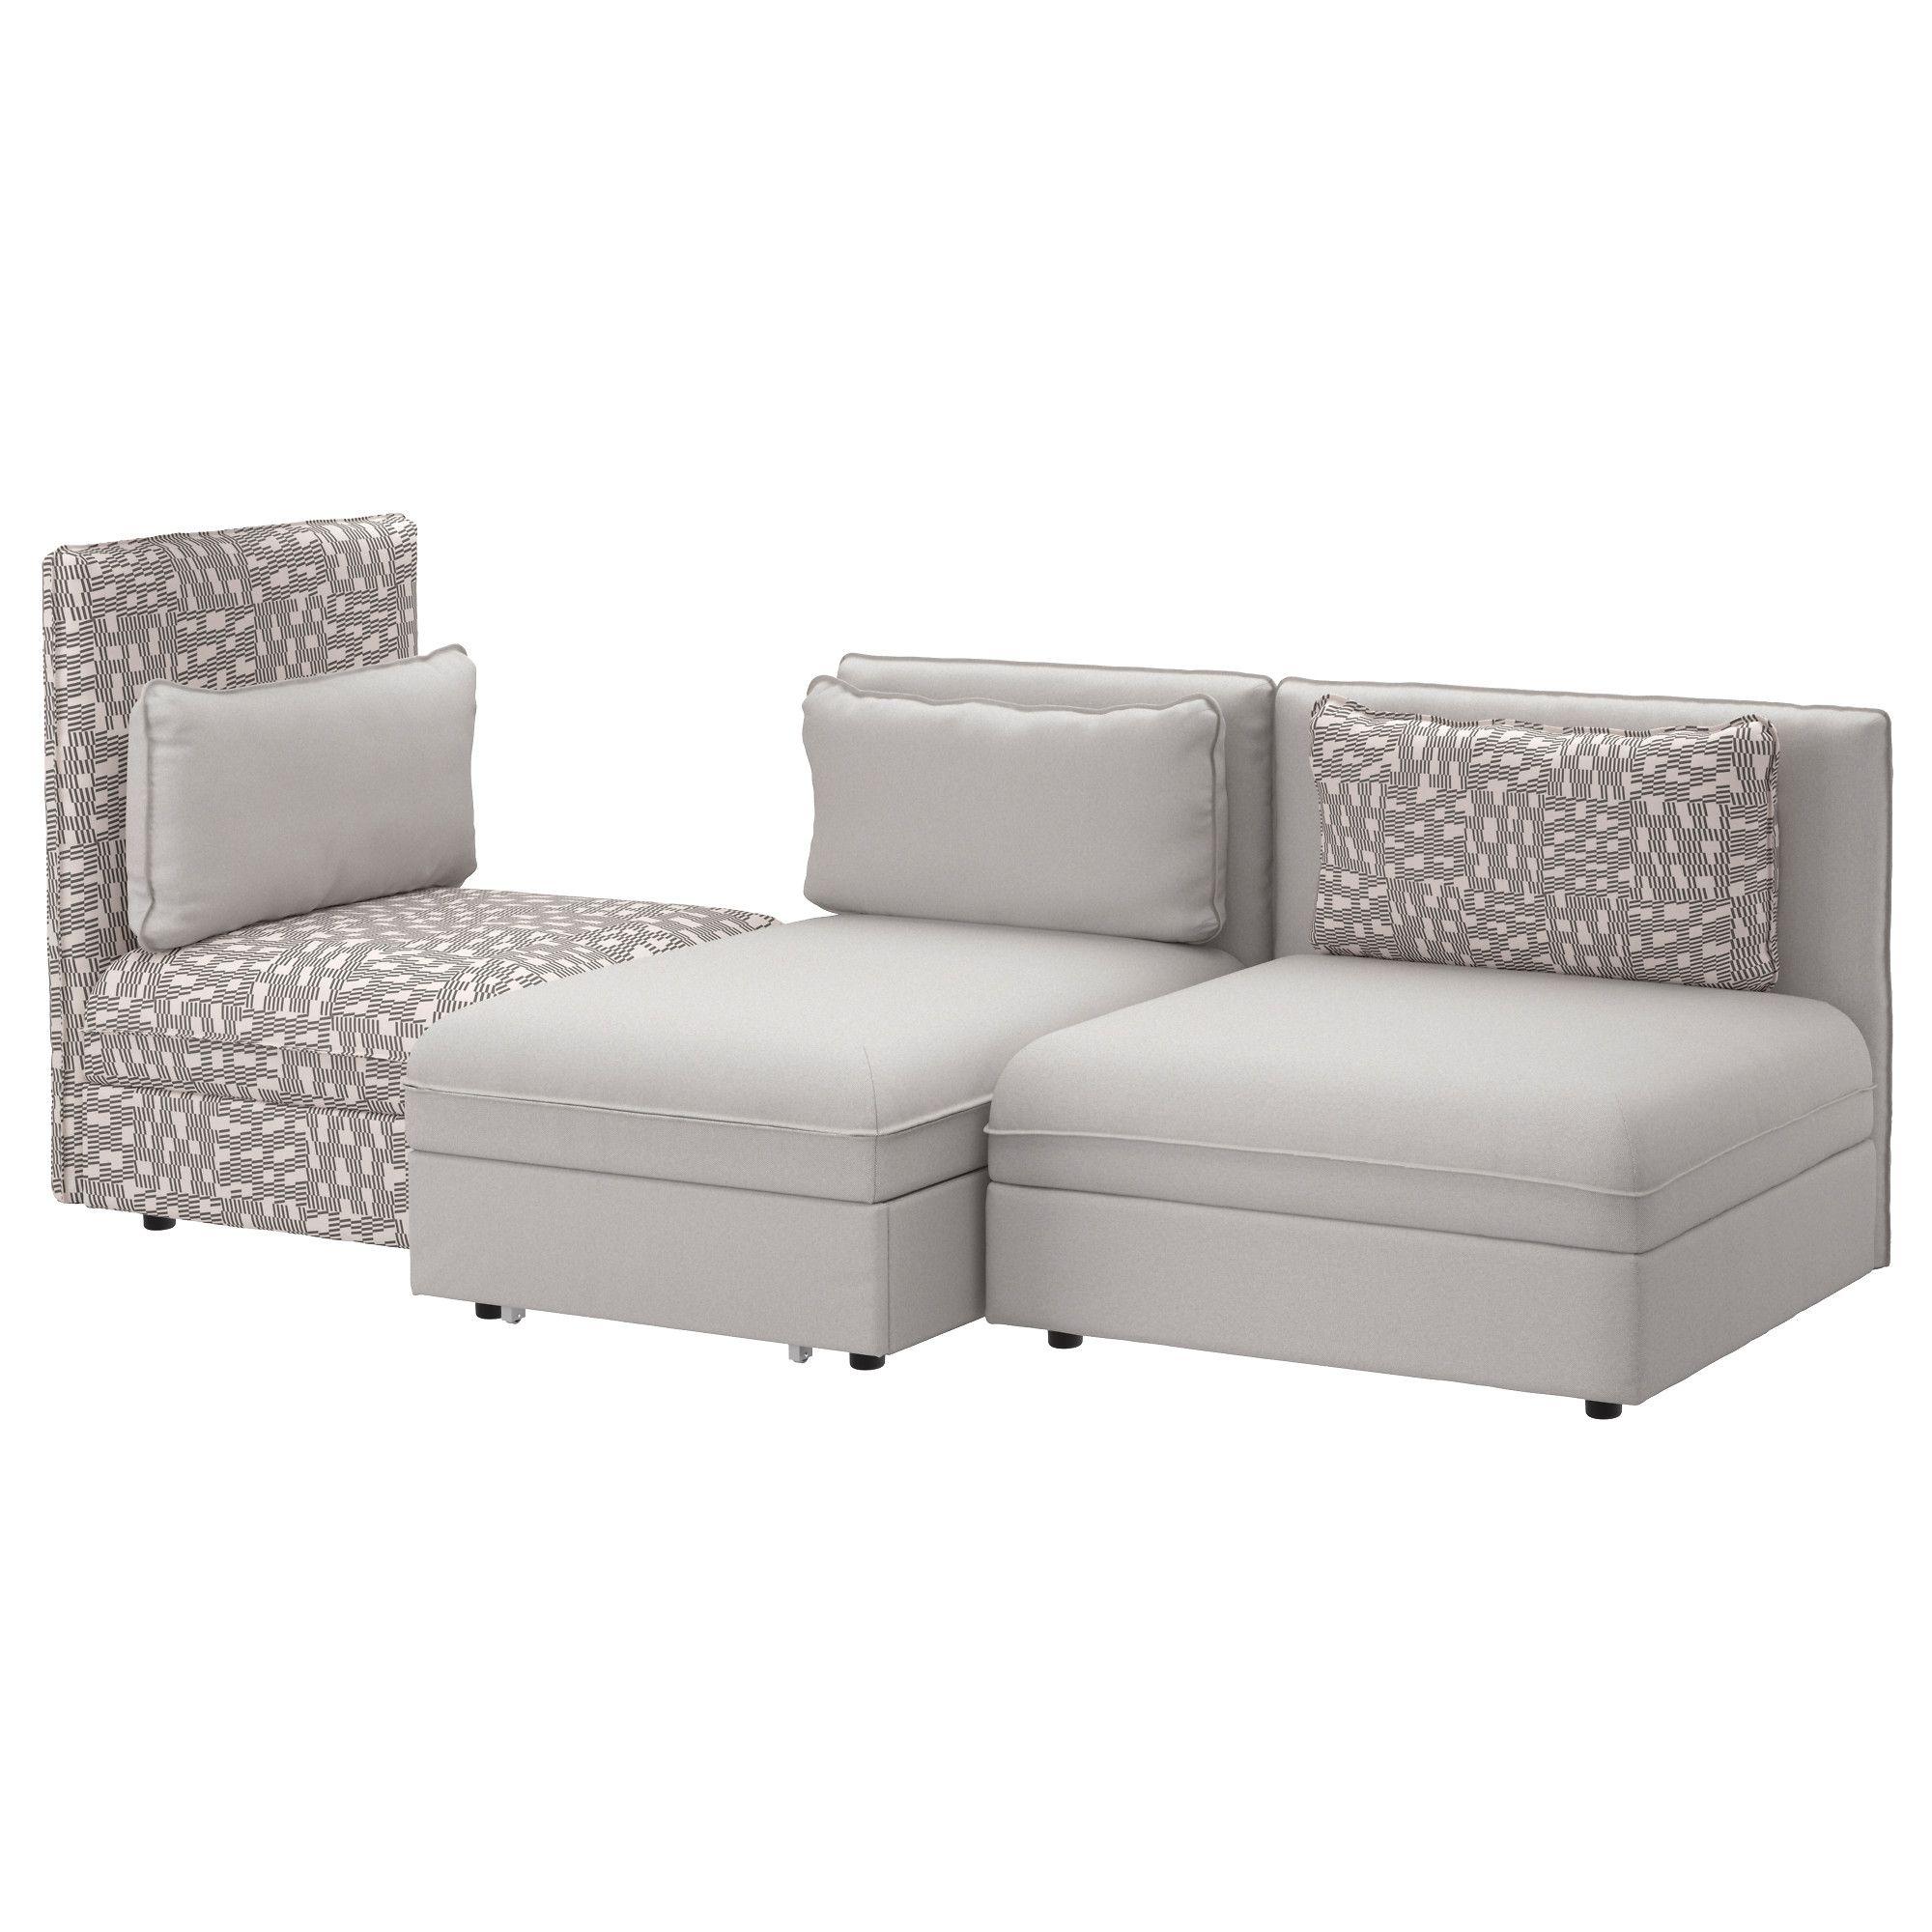 Fold Down Sofa Bed Modular Sectional Sofa Fabric Sofa Sofa